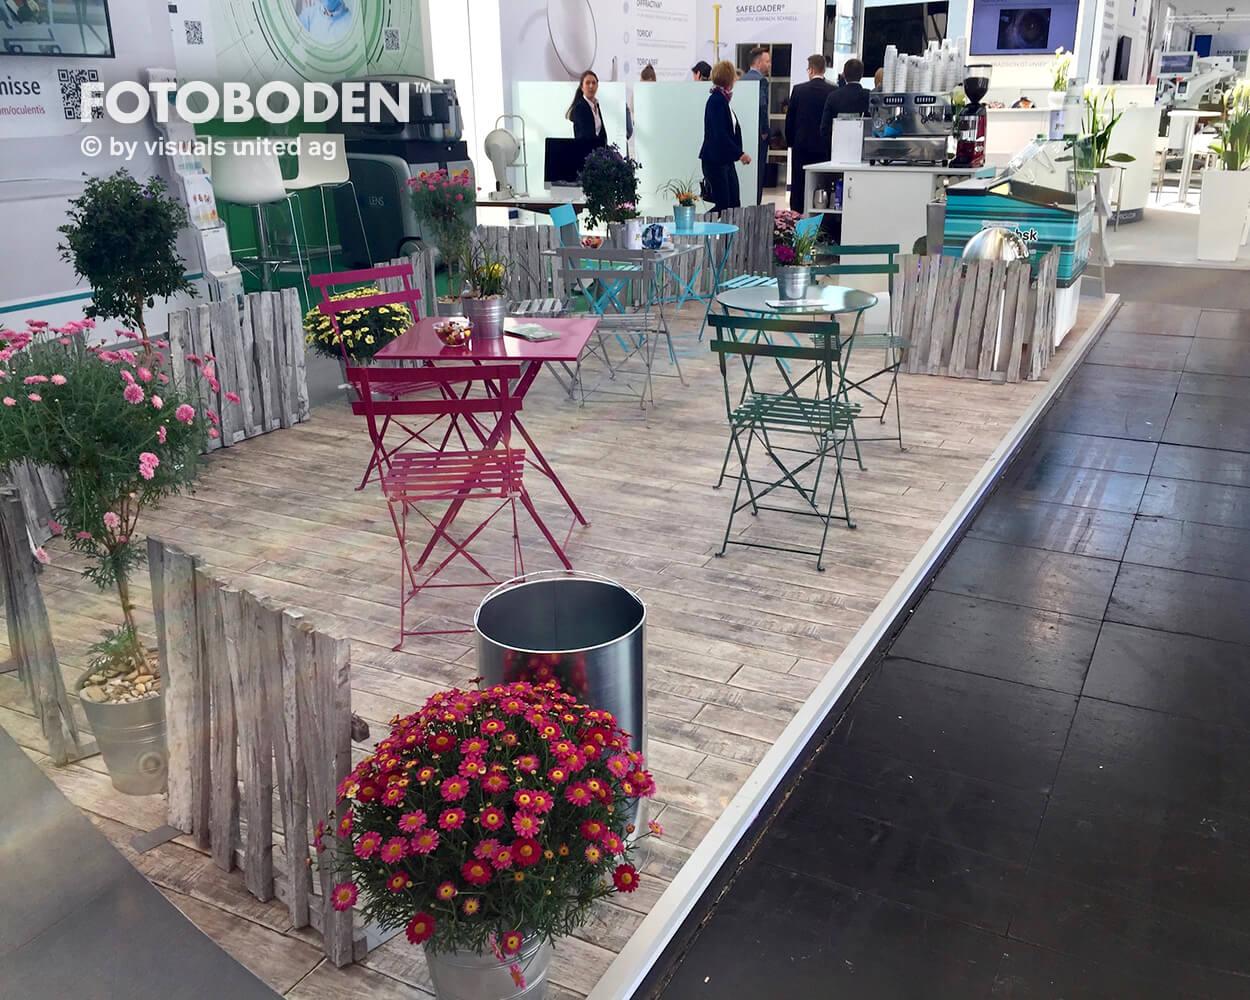 Oculentis4Fotoboden Messeboden Tradeshow Flooring Bodengestaltung Messe Bodendesign Messedesign Design Boden Messegestaltung